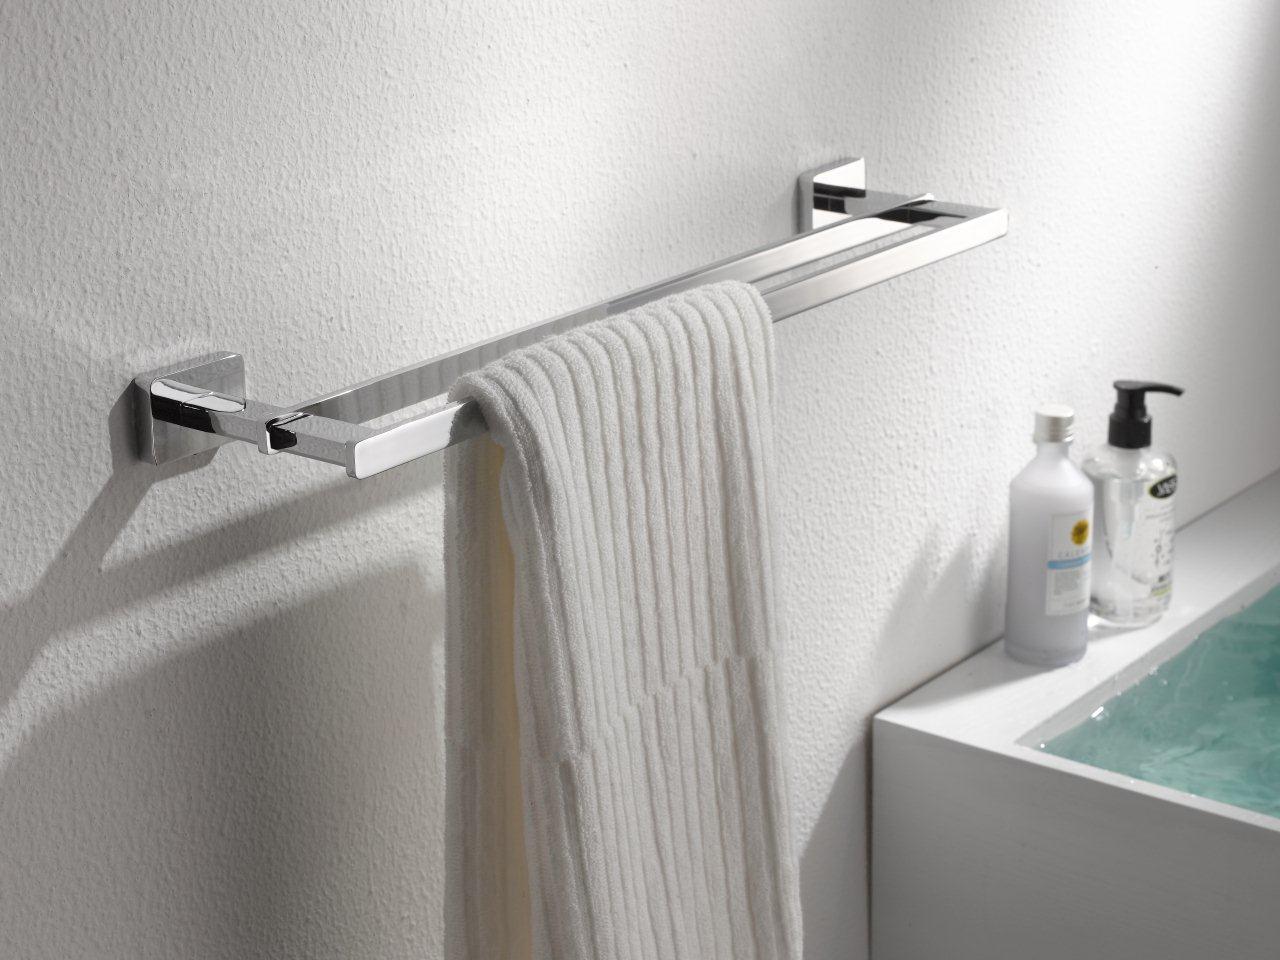 Handdoekrek vierkant model - Model badkamer douche ...